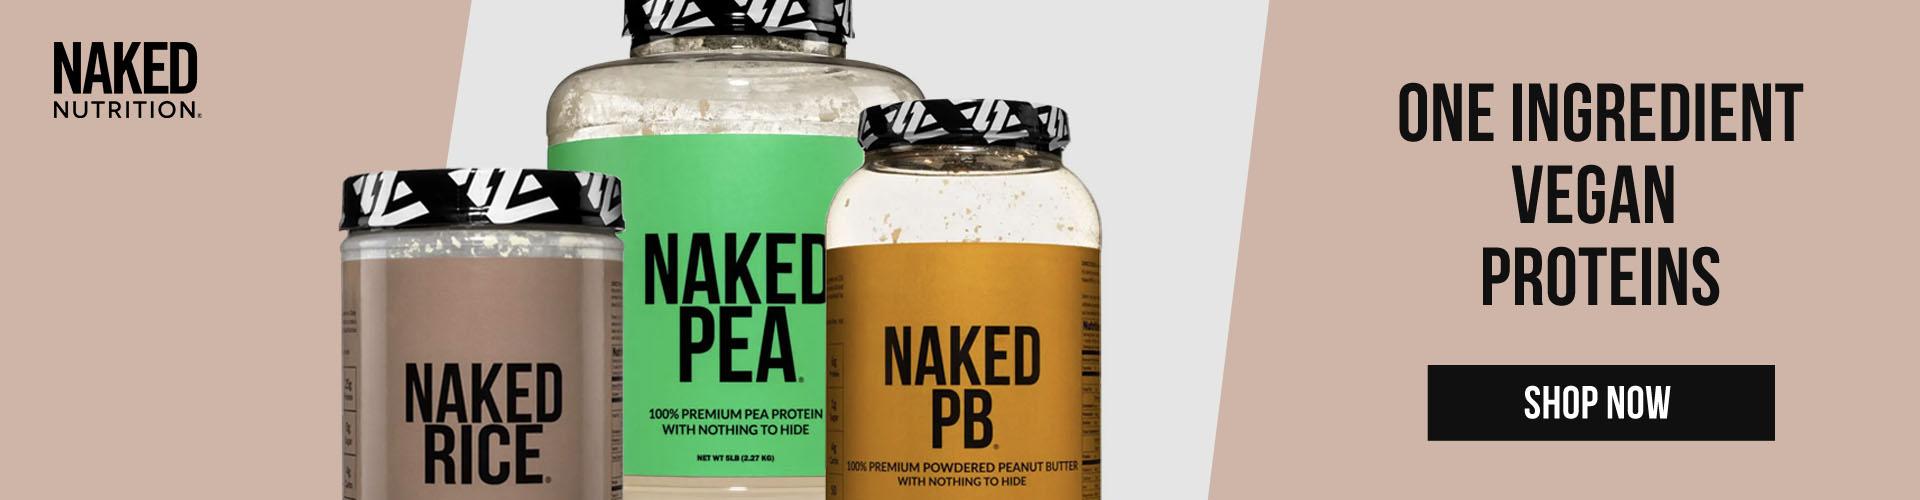 One Ingredient Vegan Proteins